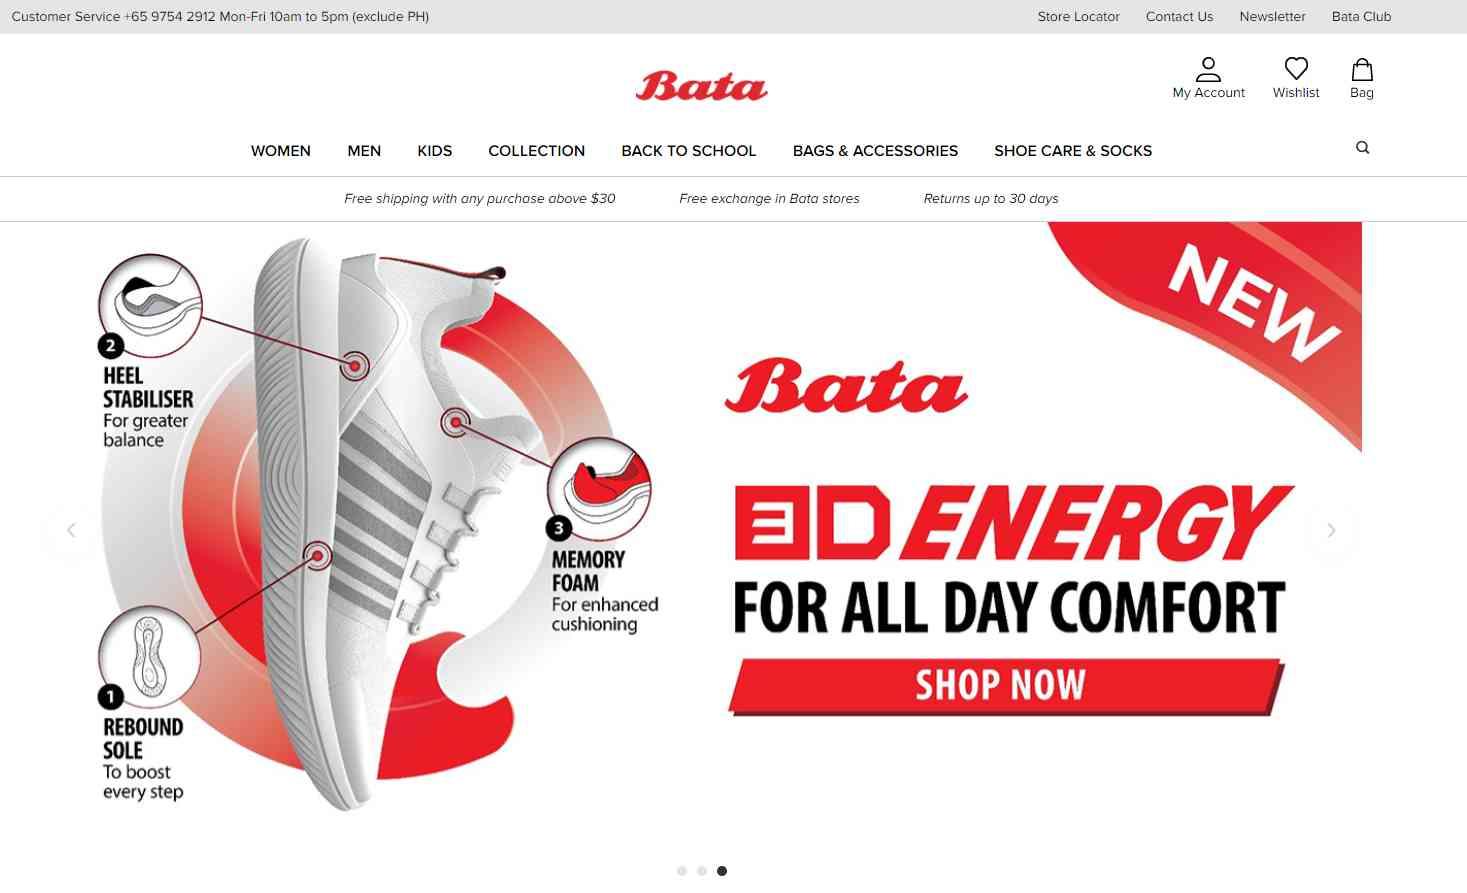 bata Top Clogs Retailers in Singapore